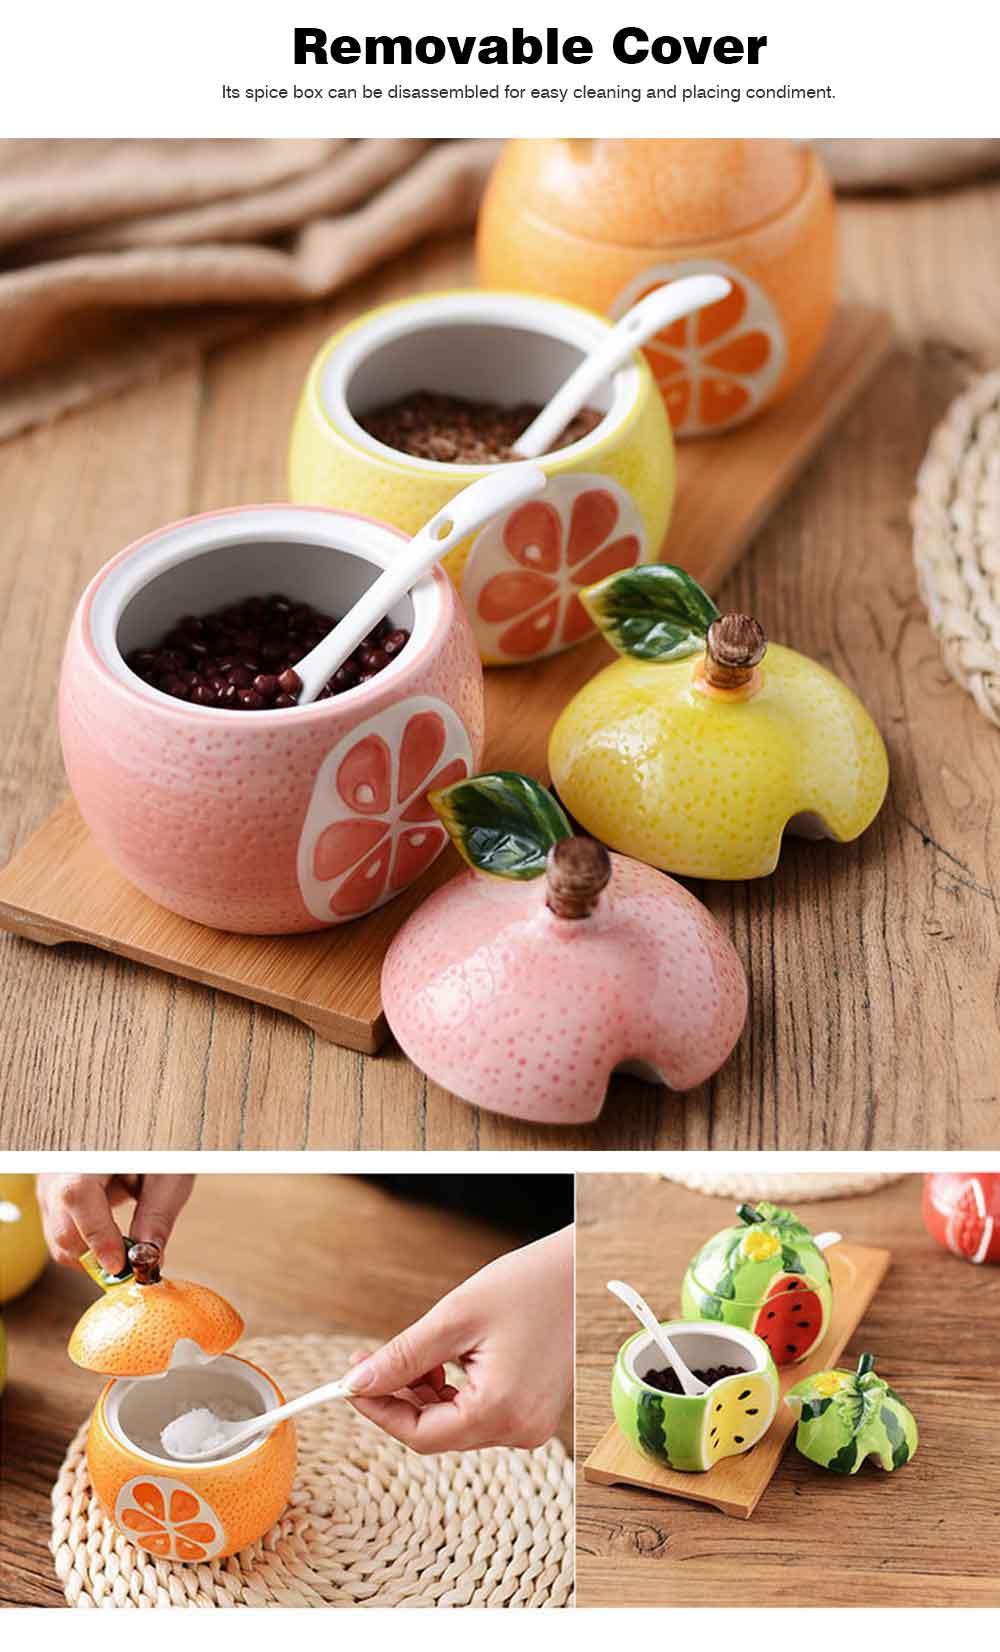 Ceramic Spice Jars With Lids, Cute Fruit Seasoning Jar For Placing Chili, Sugar, Salt 8